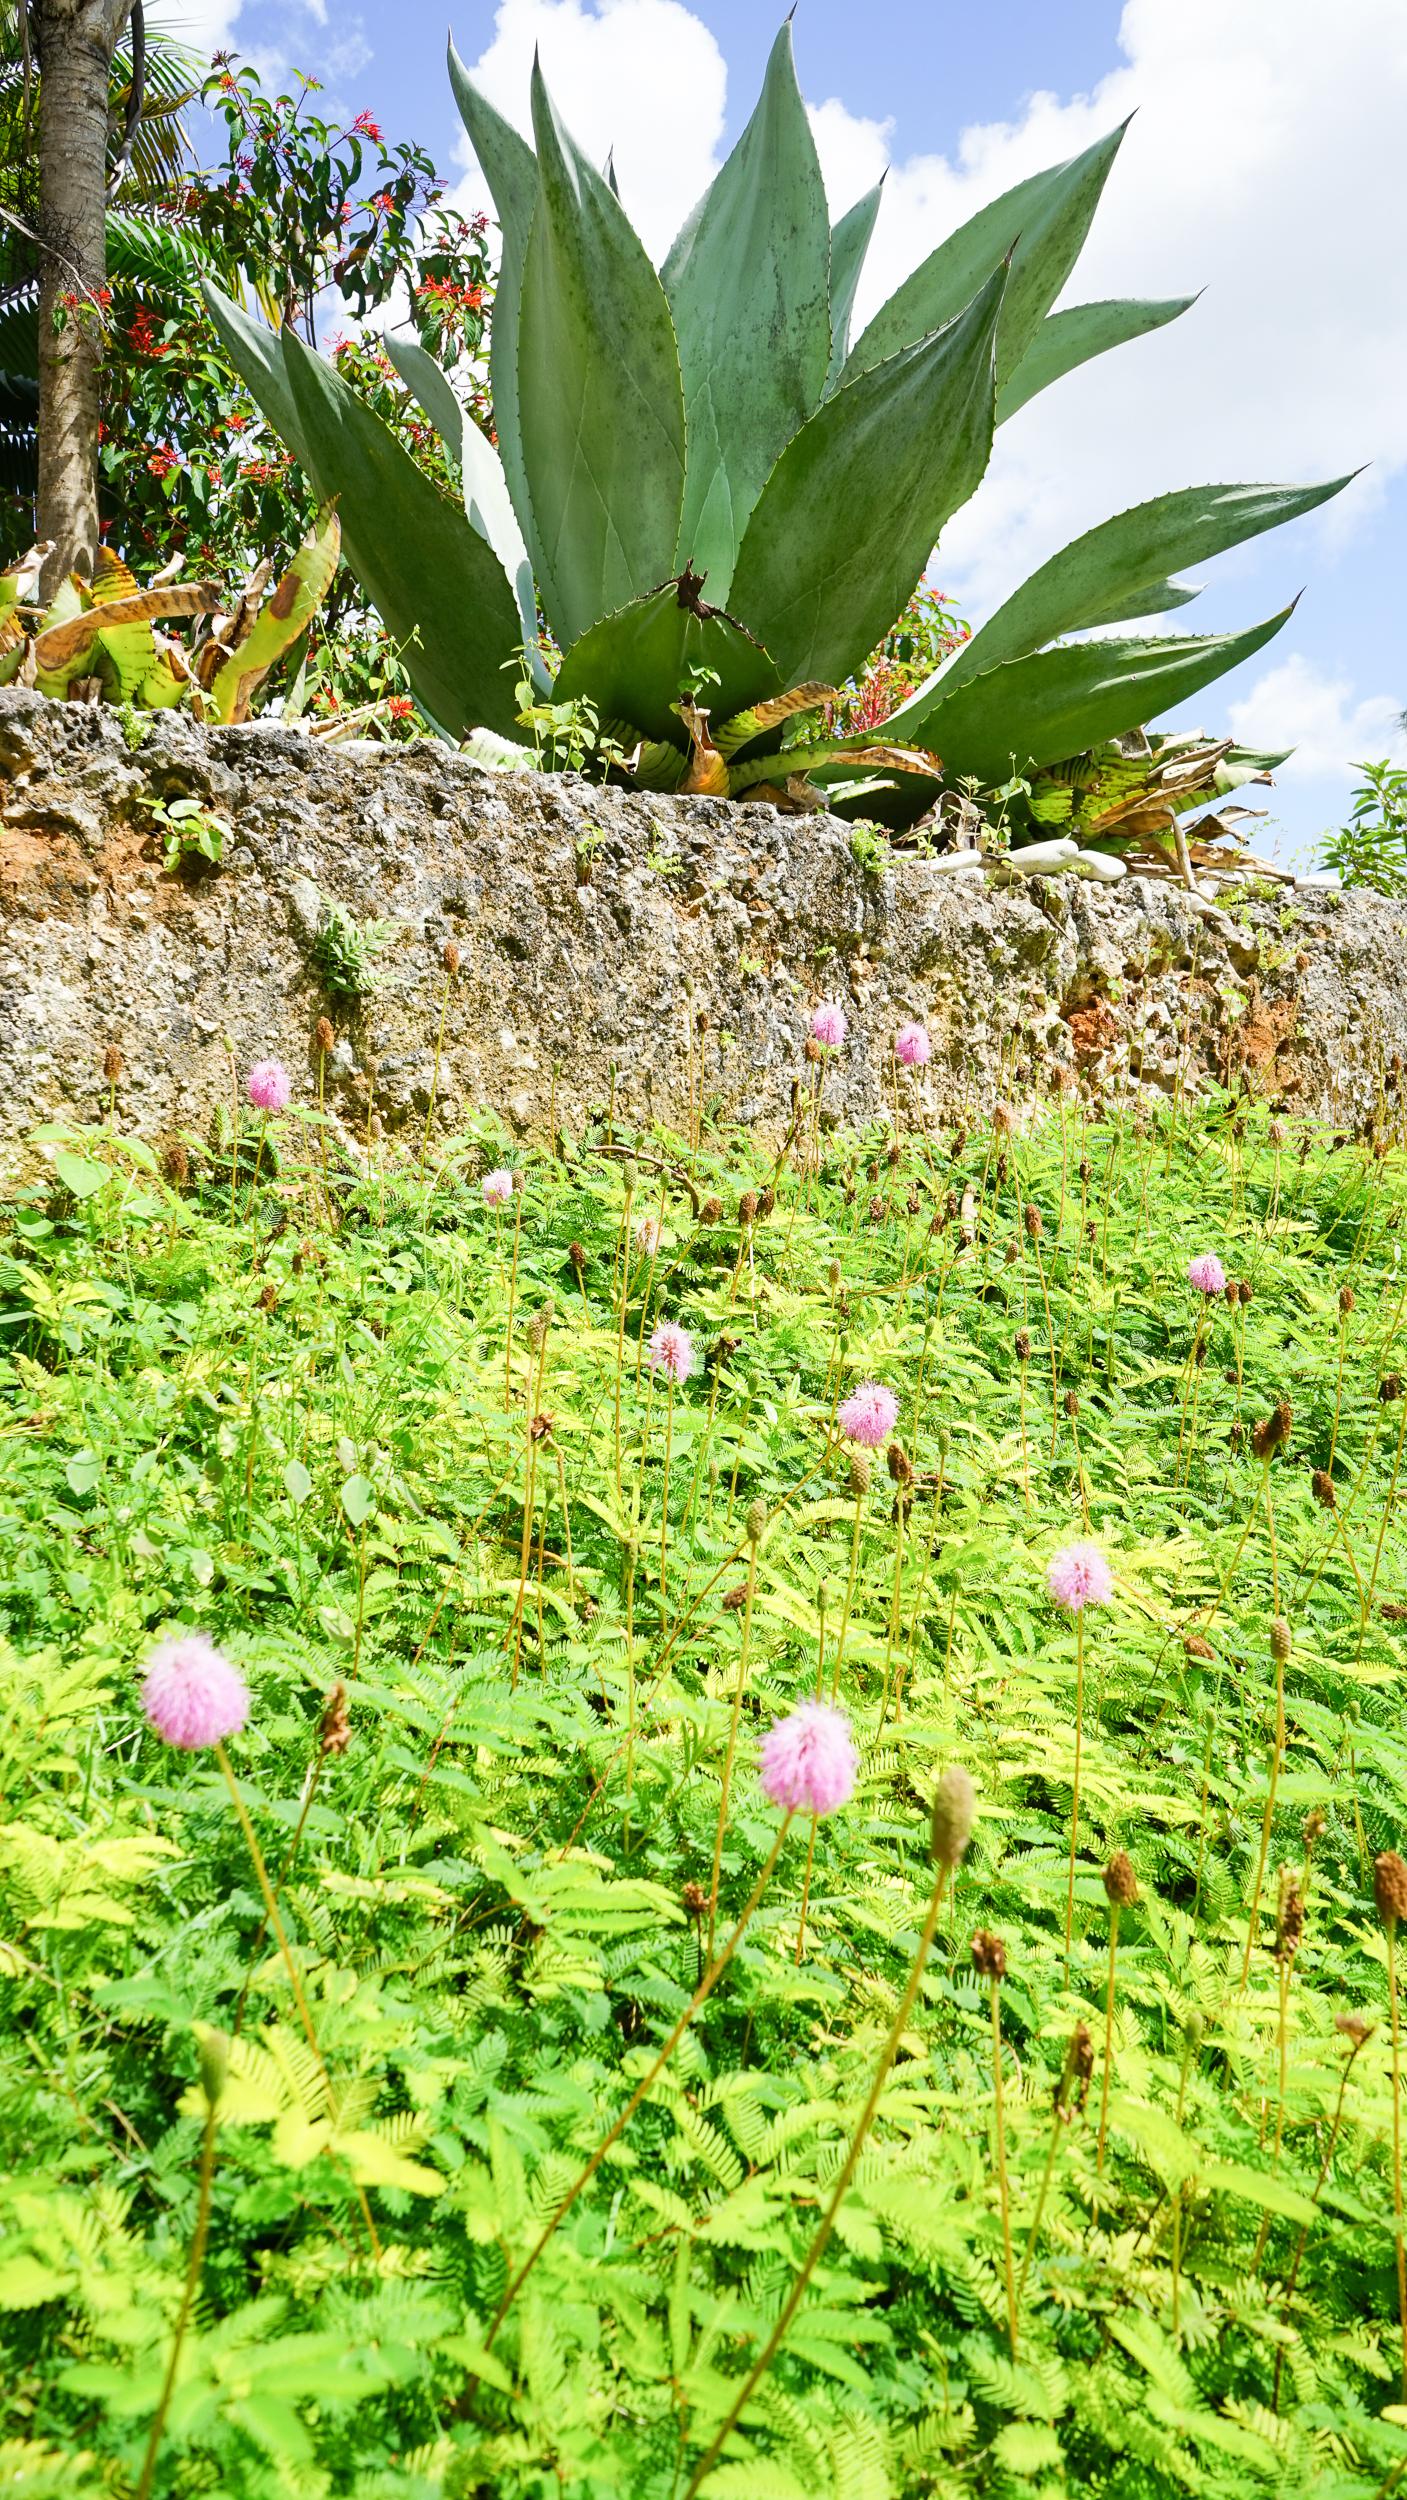 Plant Creations Nursery Sunshine Mimosa Mimosa strigillosa